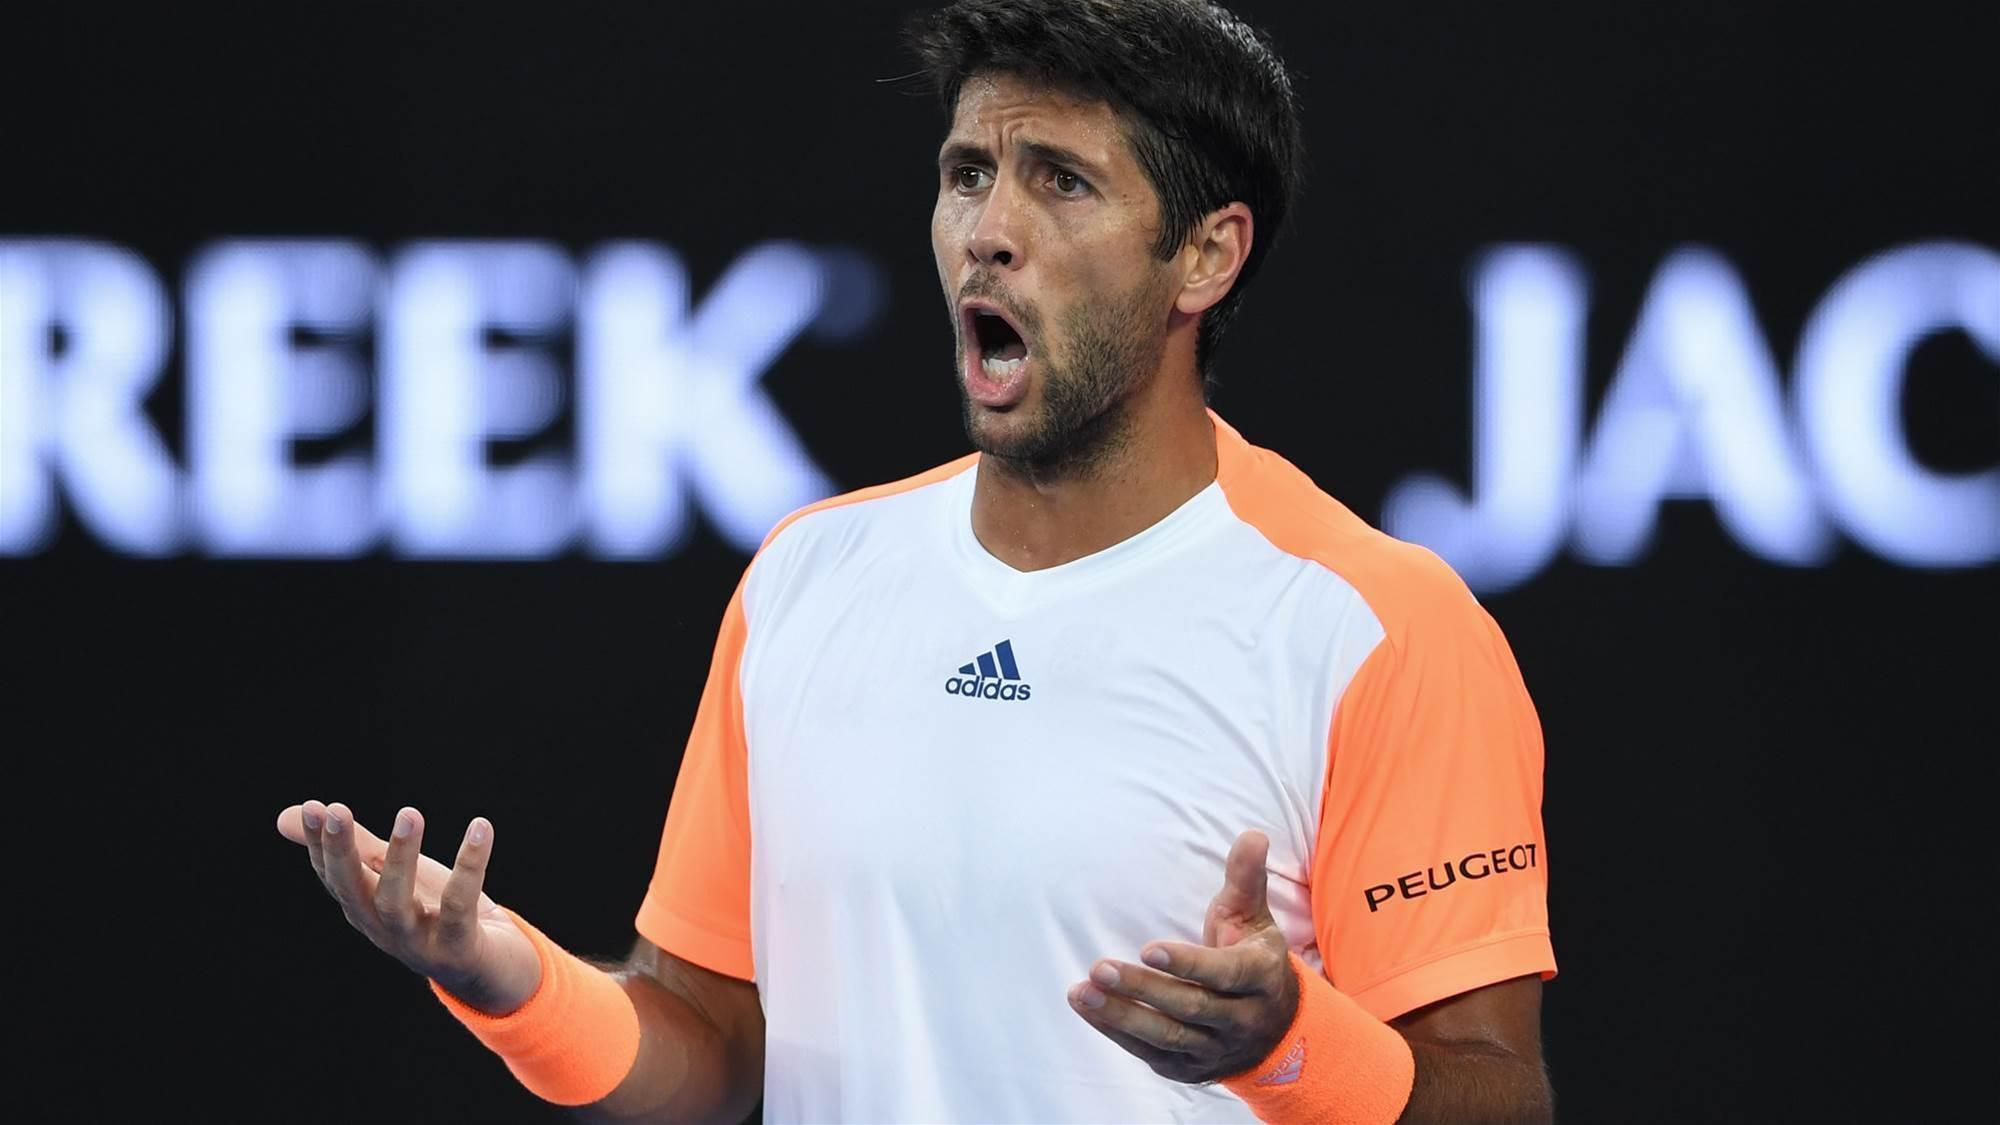 Verdasco slams court condition after loss to Djokovic